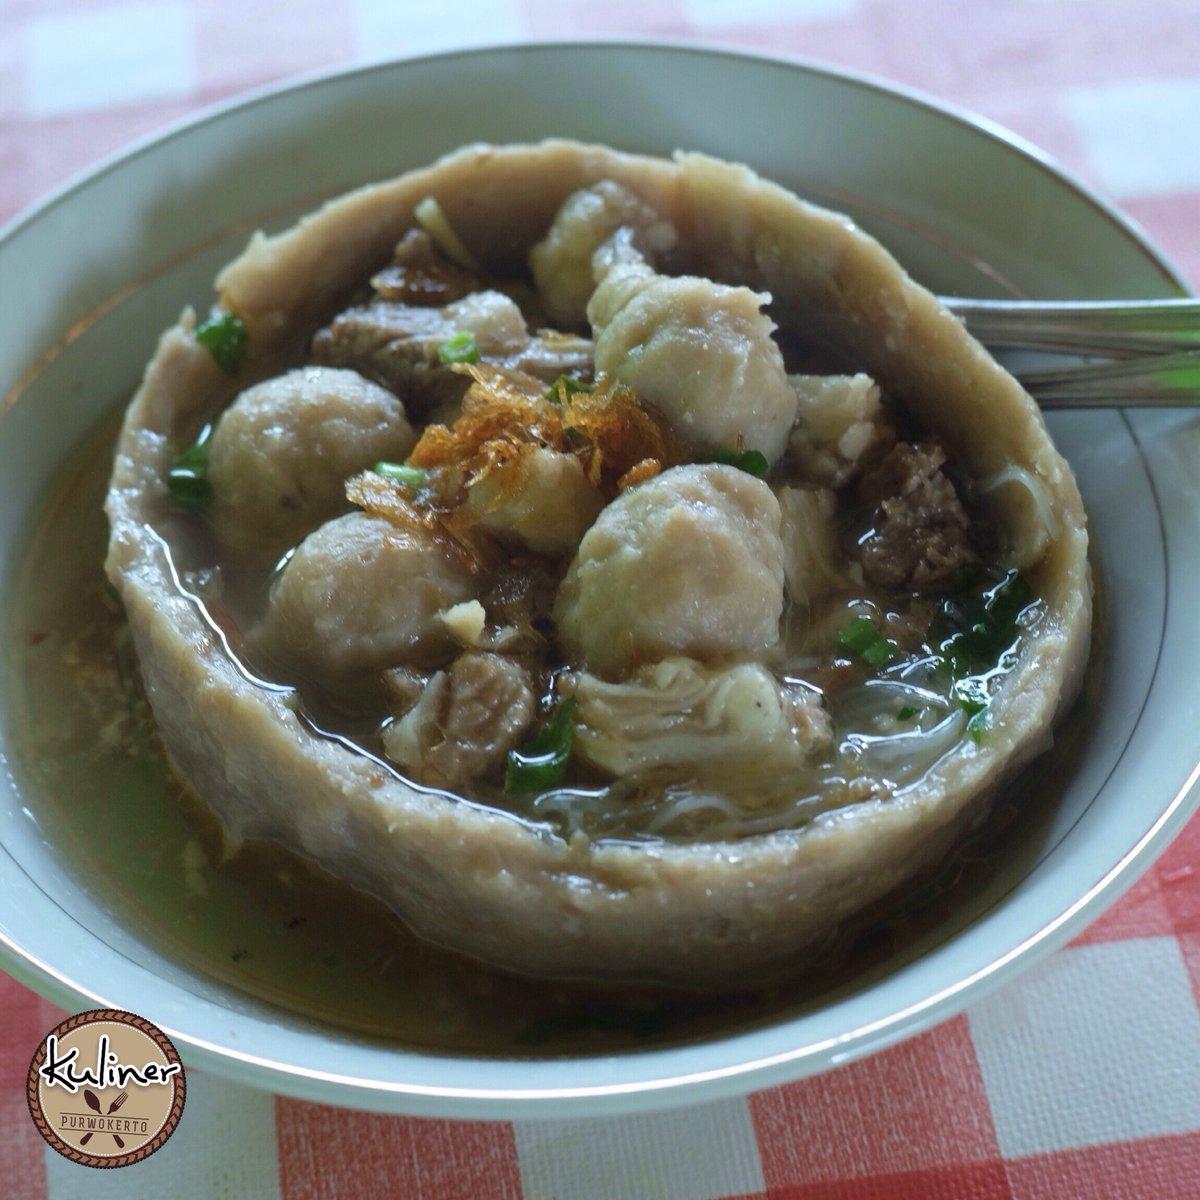 Kuliner Purwokerto On Twitter Bakso Mangkok Rp 19 500